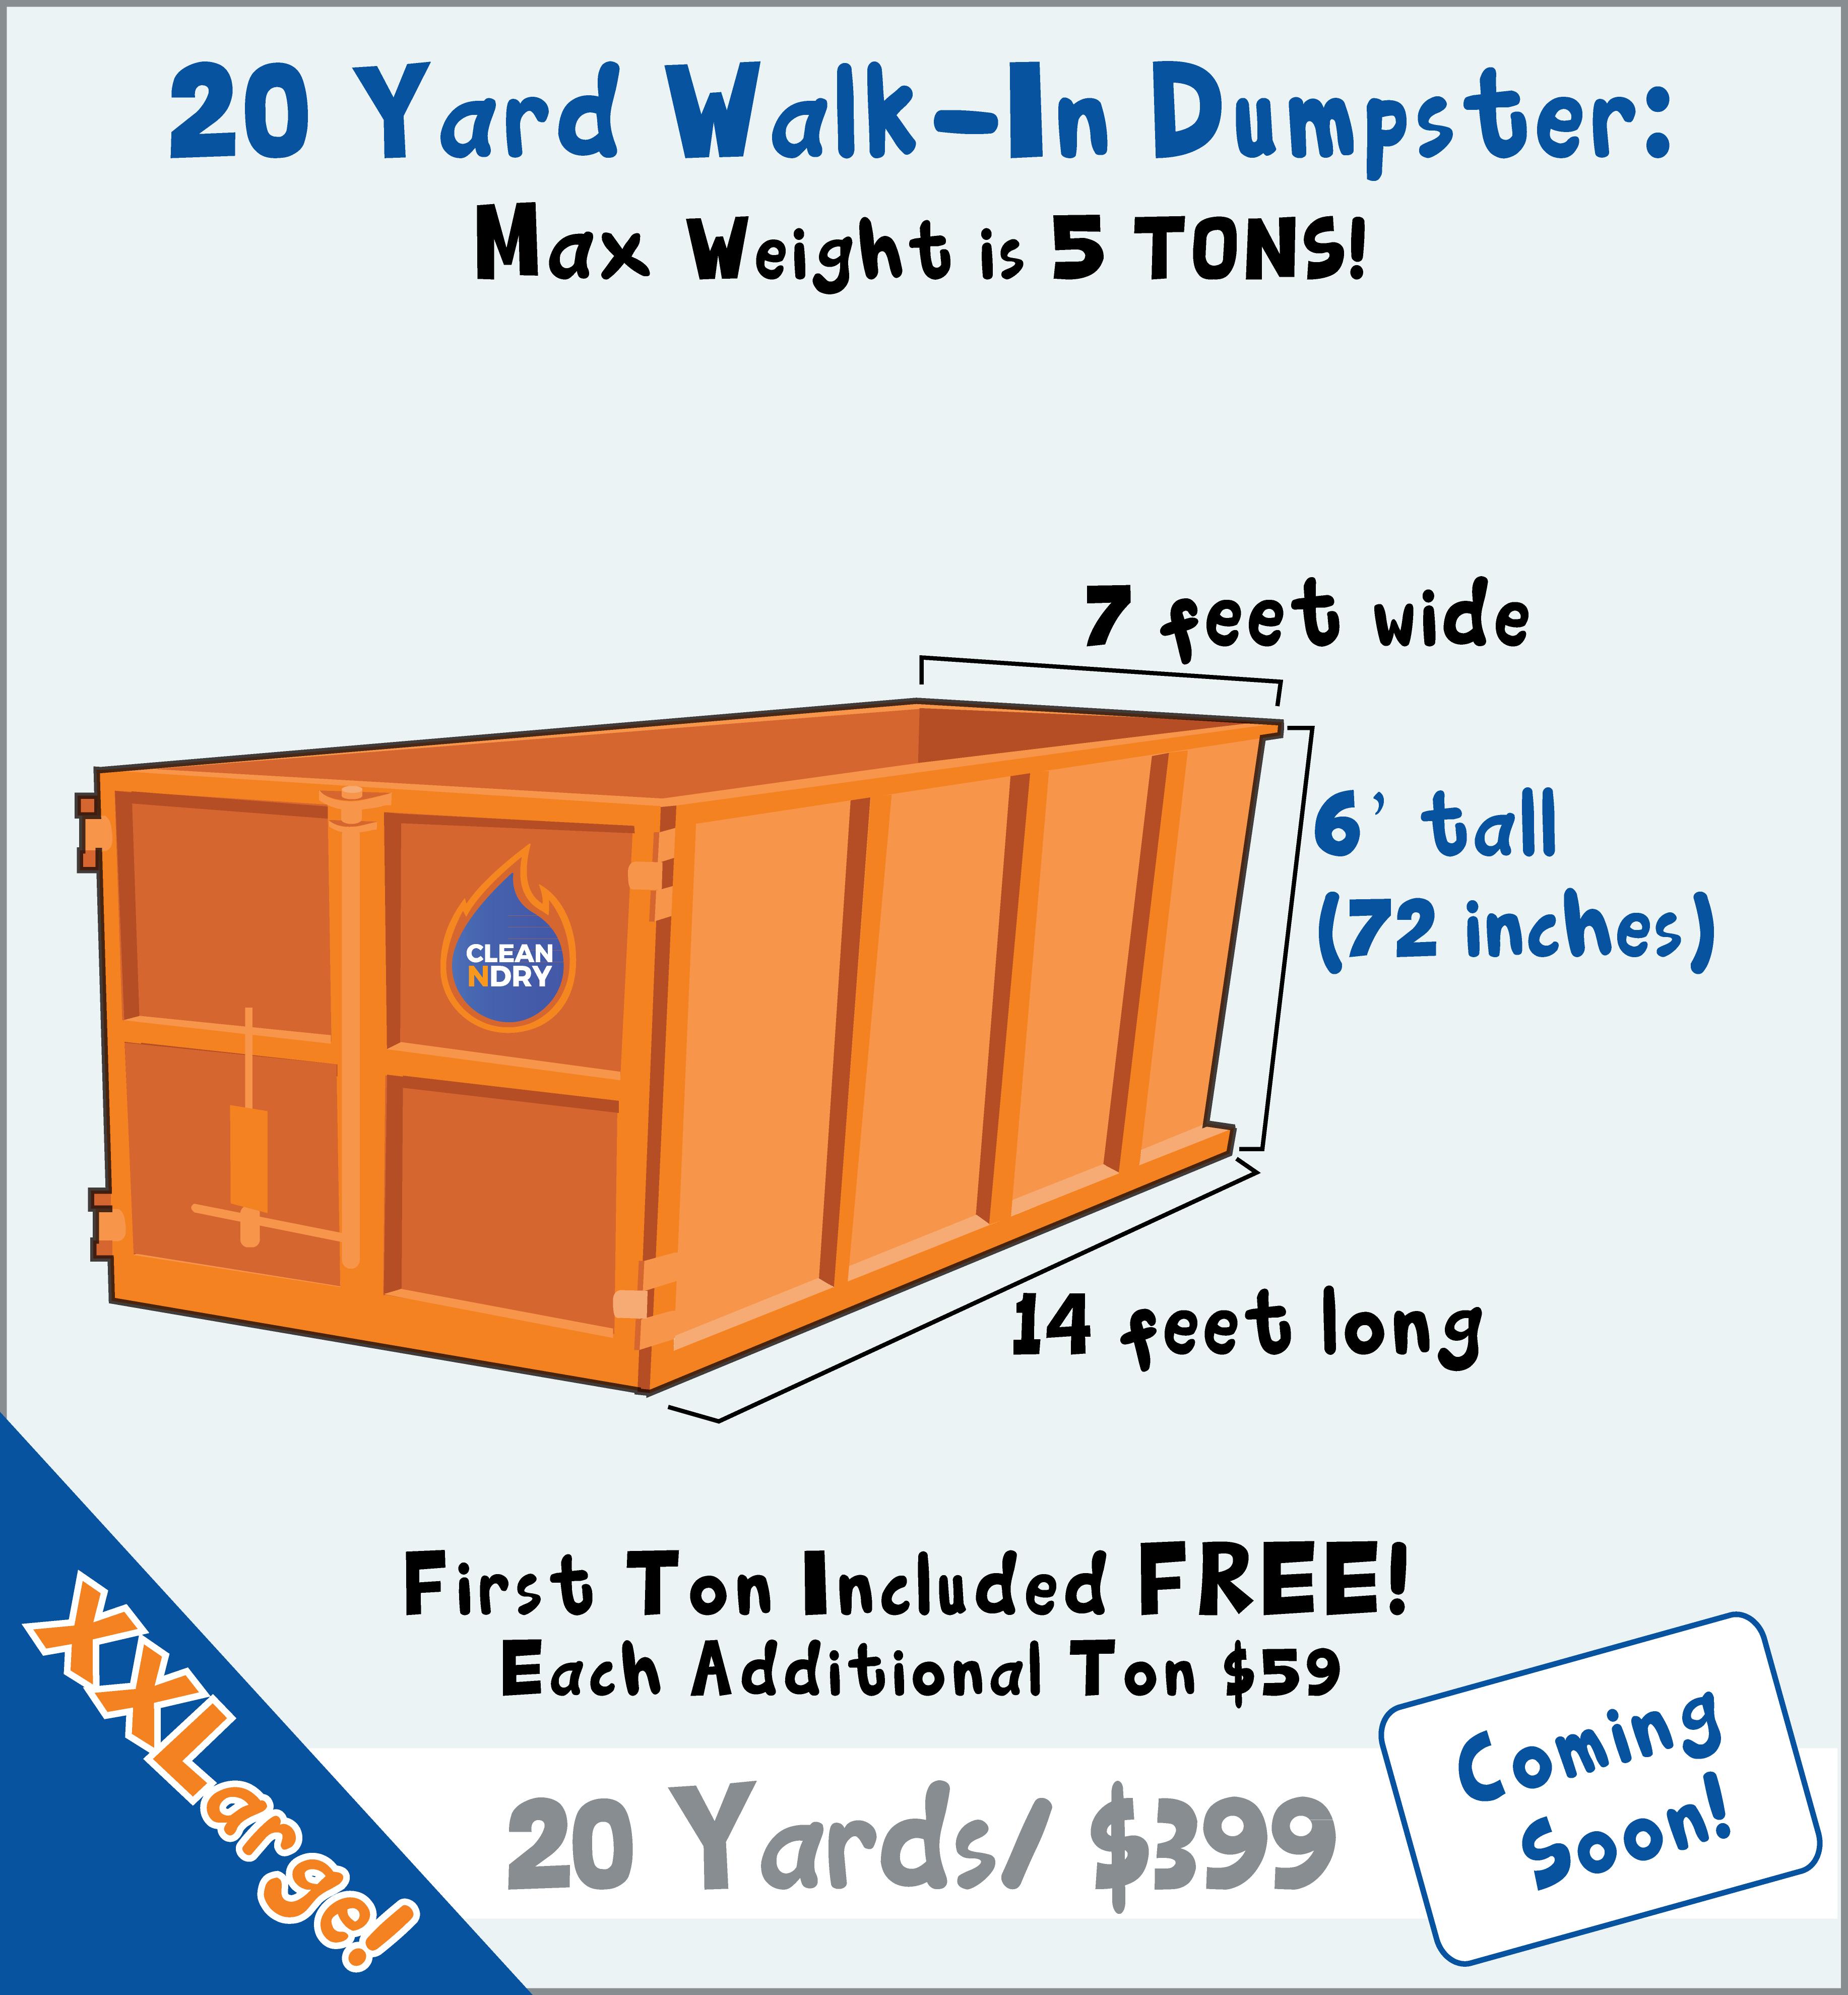 Rent a dumpster delivery orlando trash bin rental walk in dumpster rental orlando 20 yard